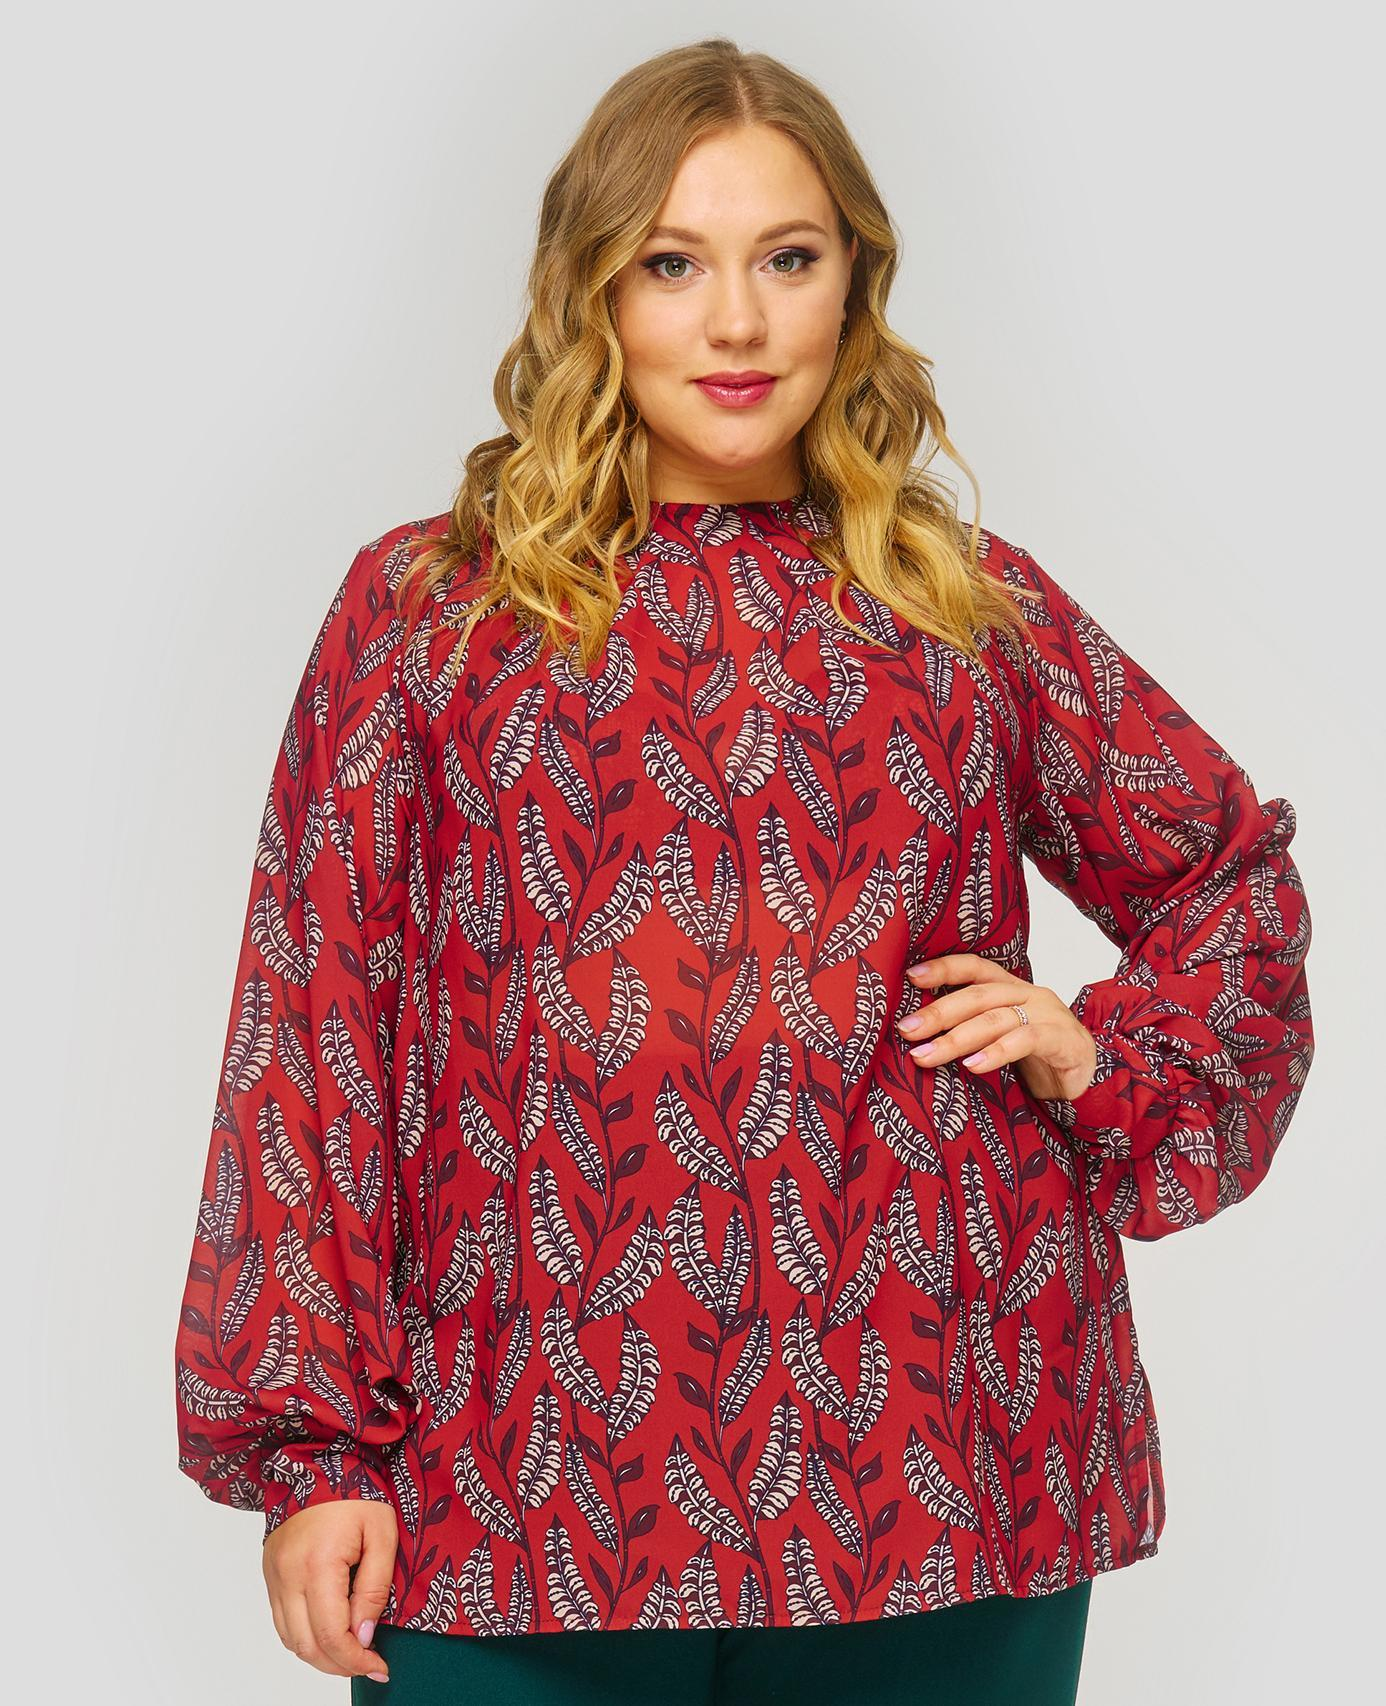 Блузки Блузка с принтом 1822502 242abb260541c73fb6b9c79d063c62e8.jpg